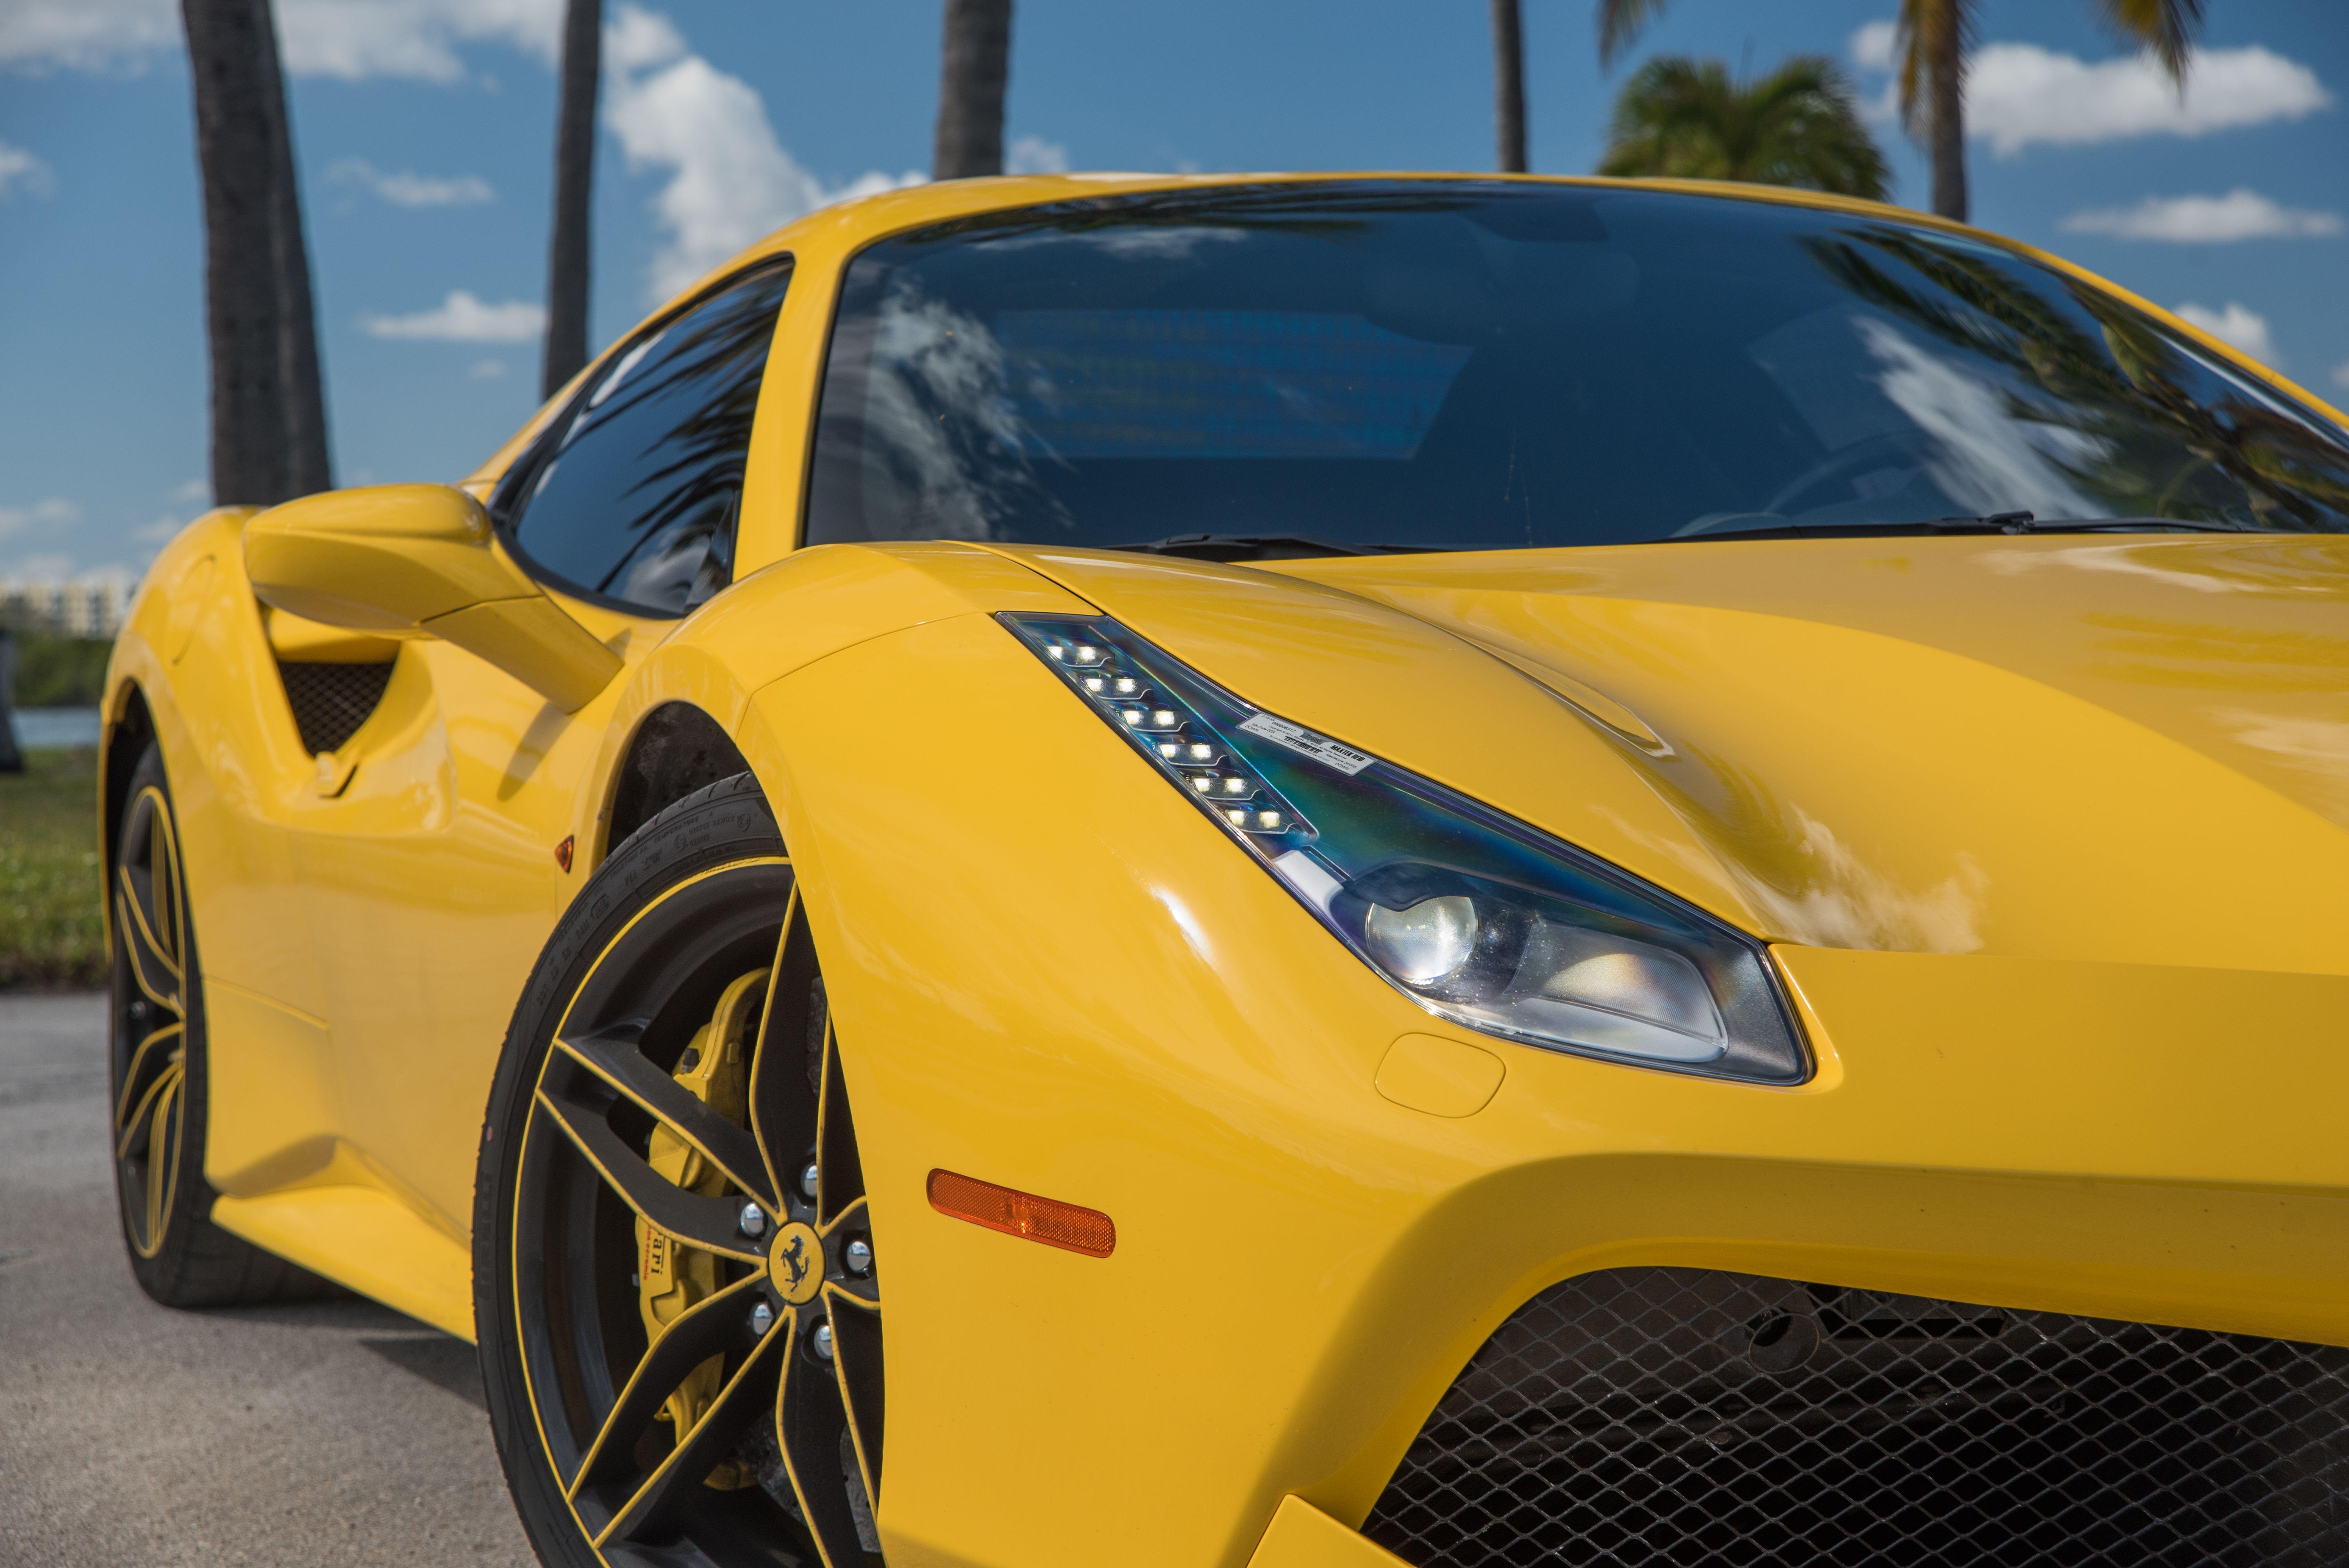 Exotic Rental Cars Ft Lauderdale Pugachev Luxury Car Rental